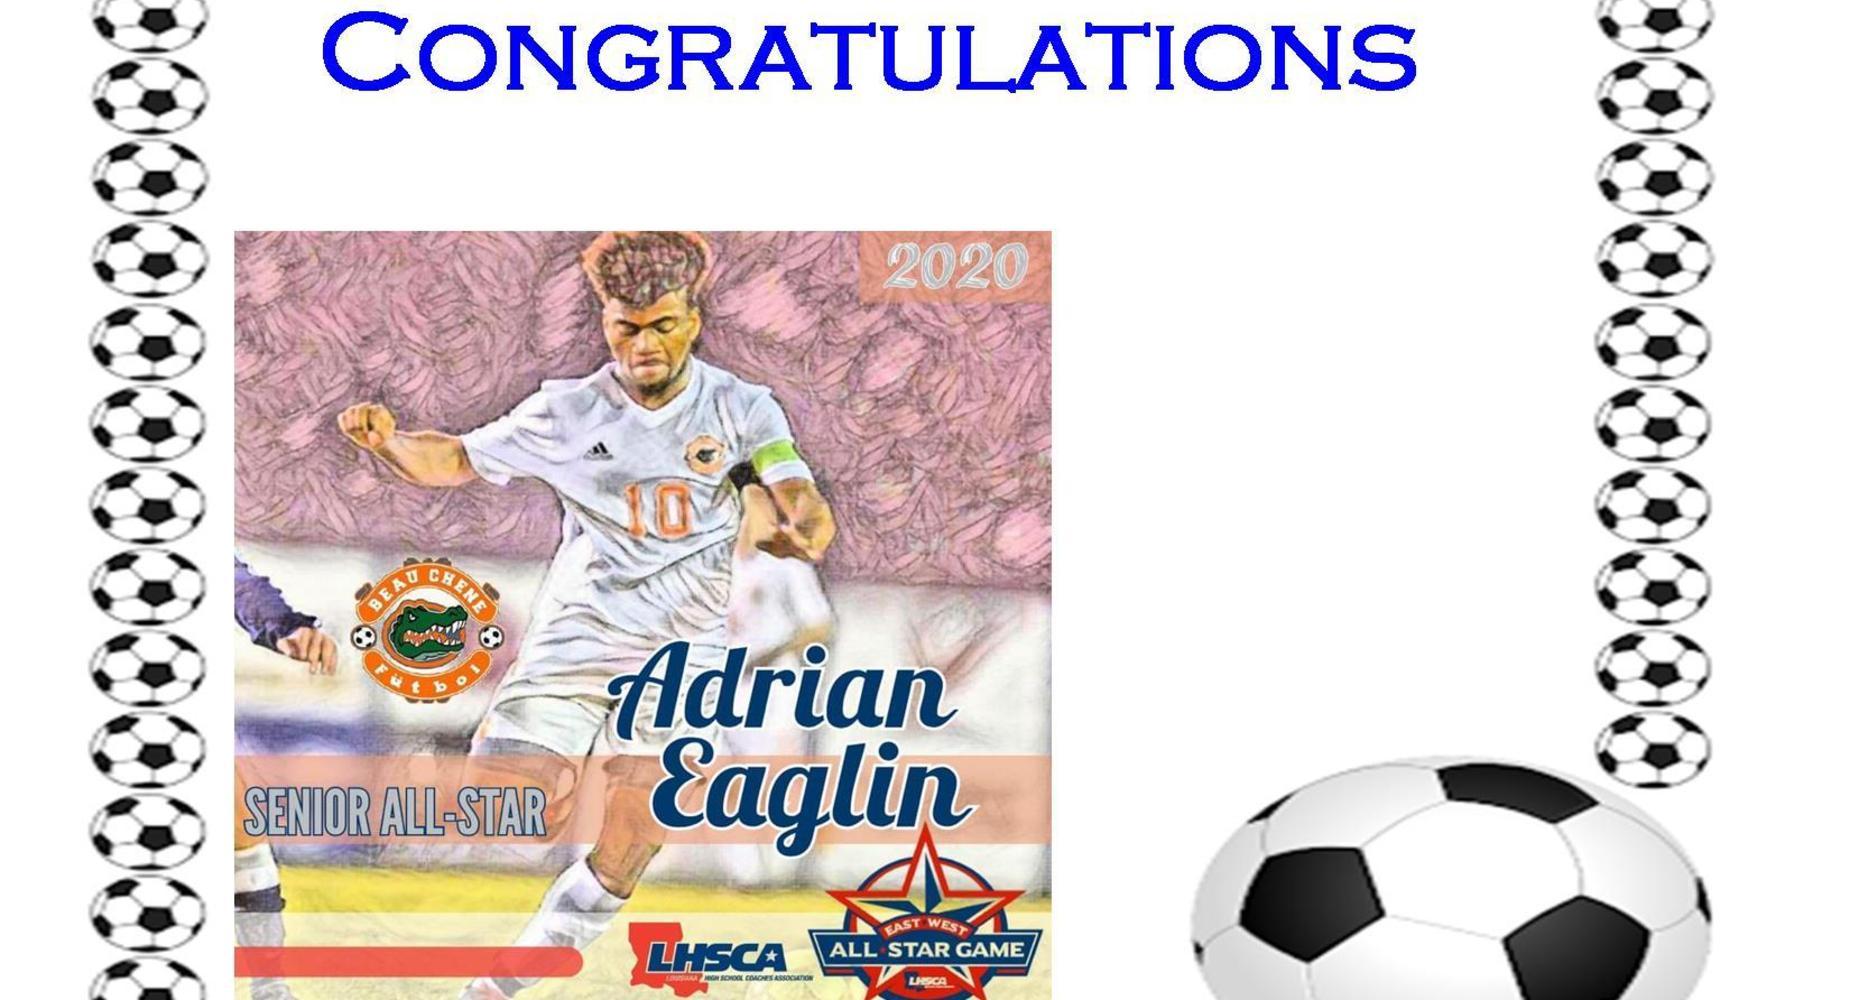 Senior Soccer Player Adrian Eaglin is a 2020 Senior All Star